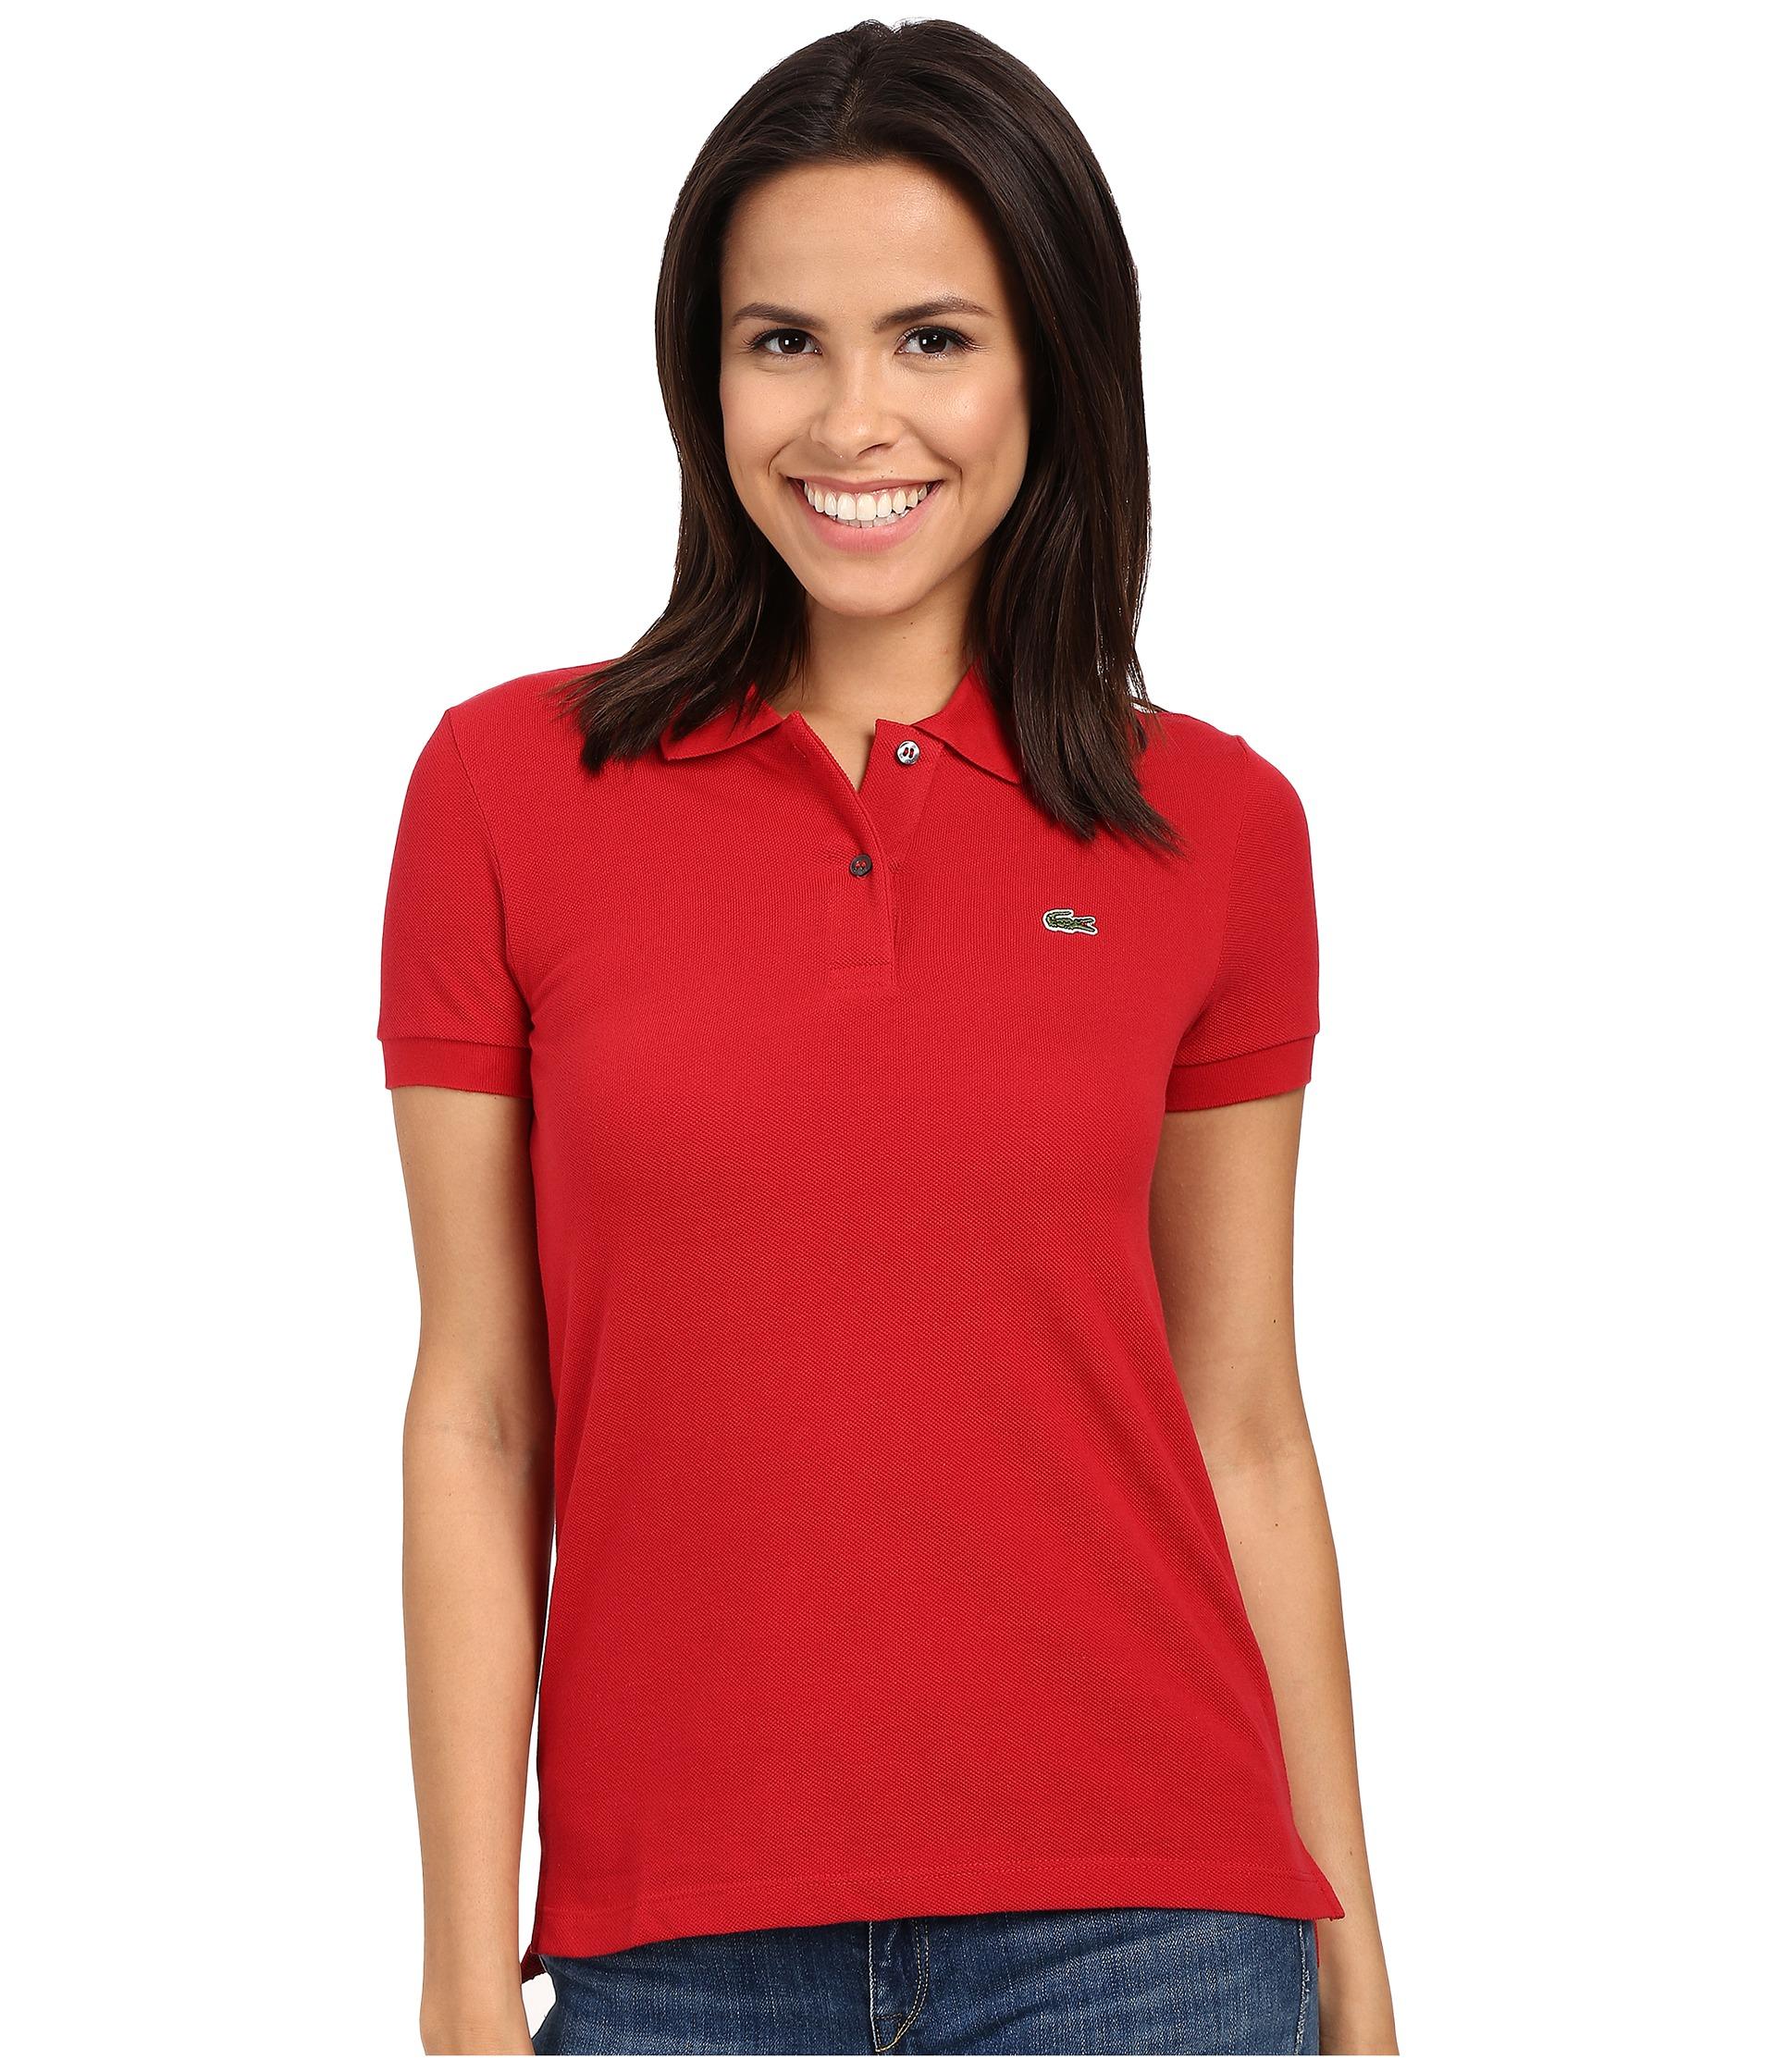 f7485e9c Lacoste Ladies Polo Shirts - DREAMWORKS